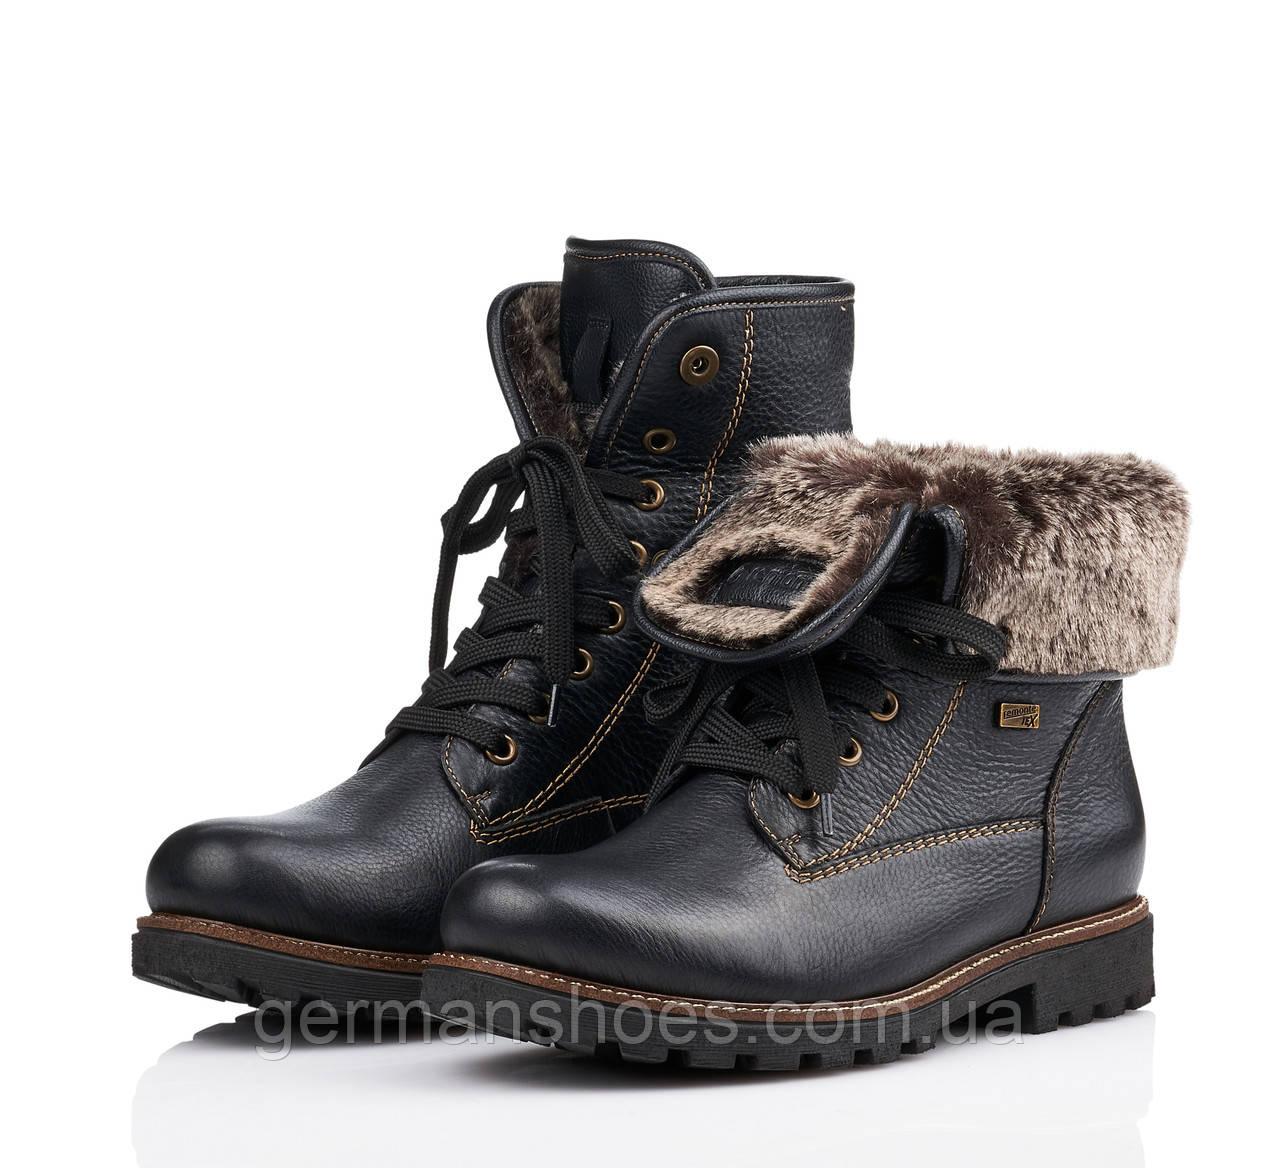 Ботинки женские Remonte D7474-01